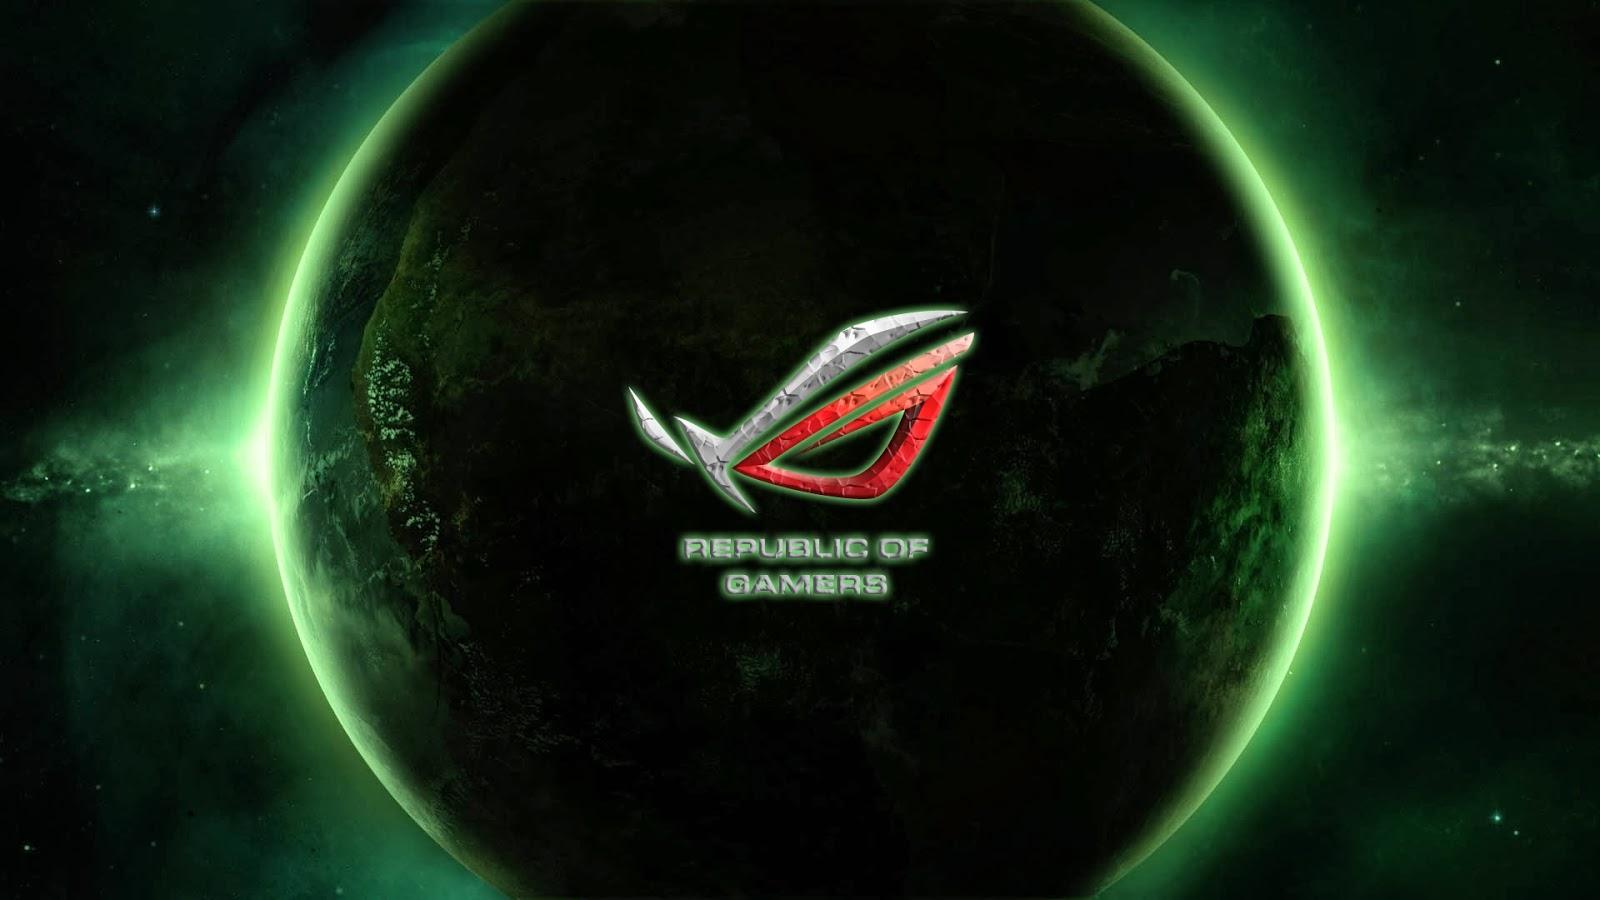 Republic of Gamers Logo Brand Space Planet Widescreen HD Wallpaper i09 1600x900